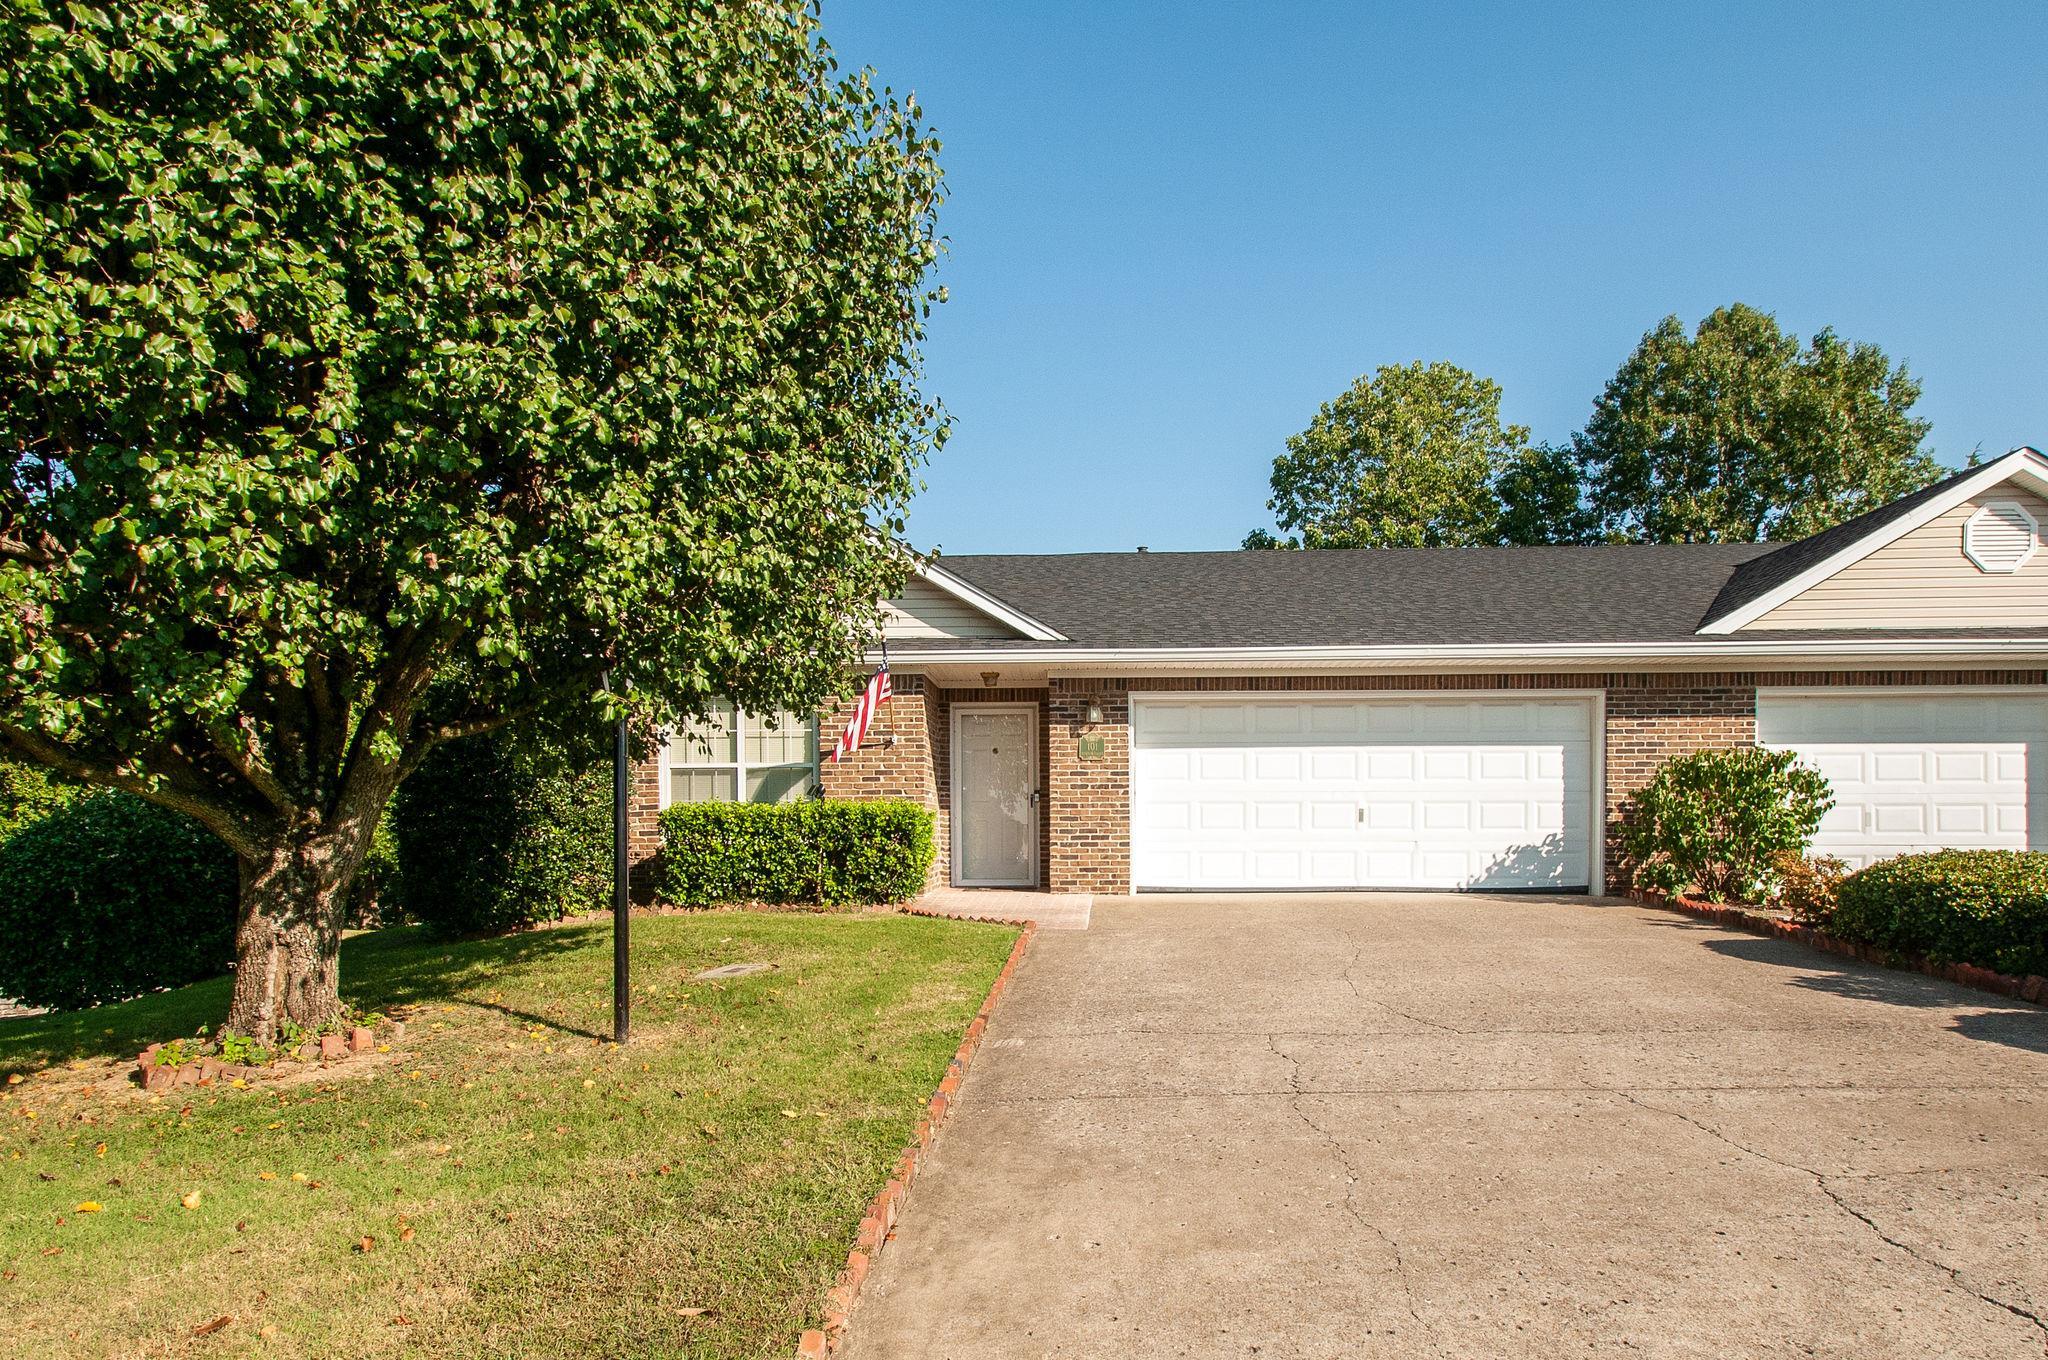 101 Newsom Grn, Nashville, TN 37221 - Nashville, TN real estate listing